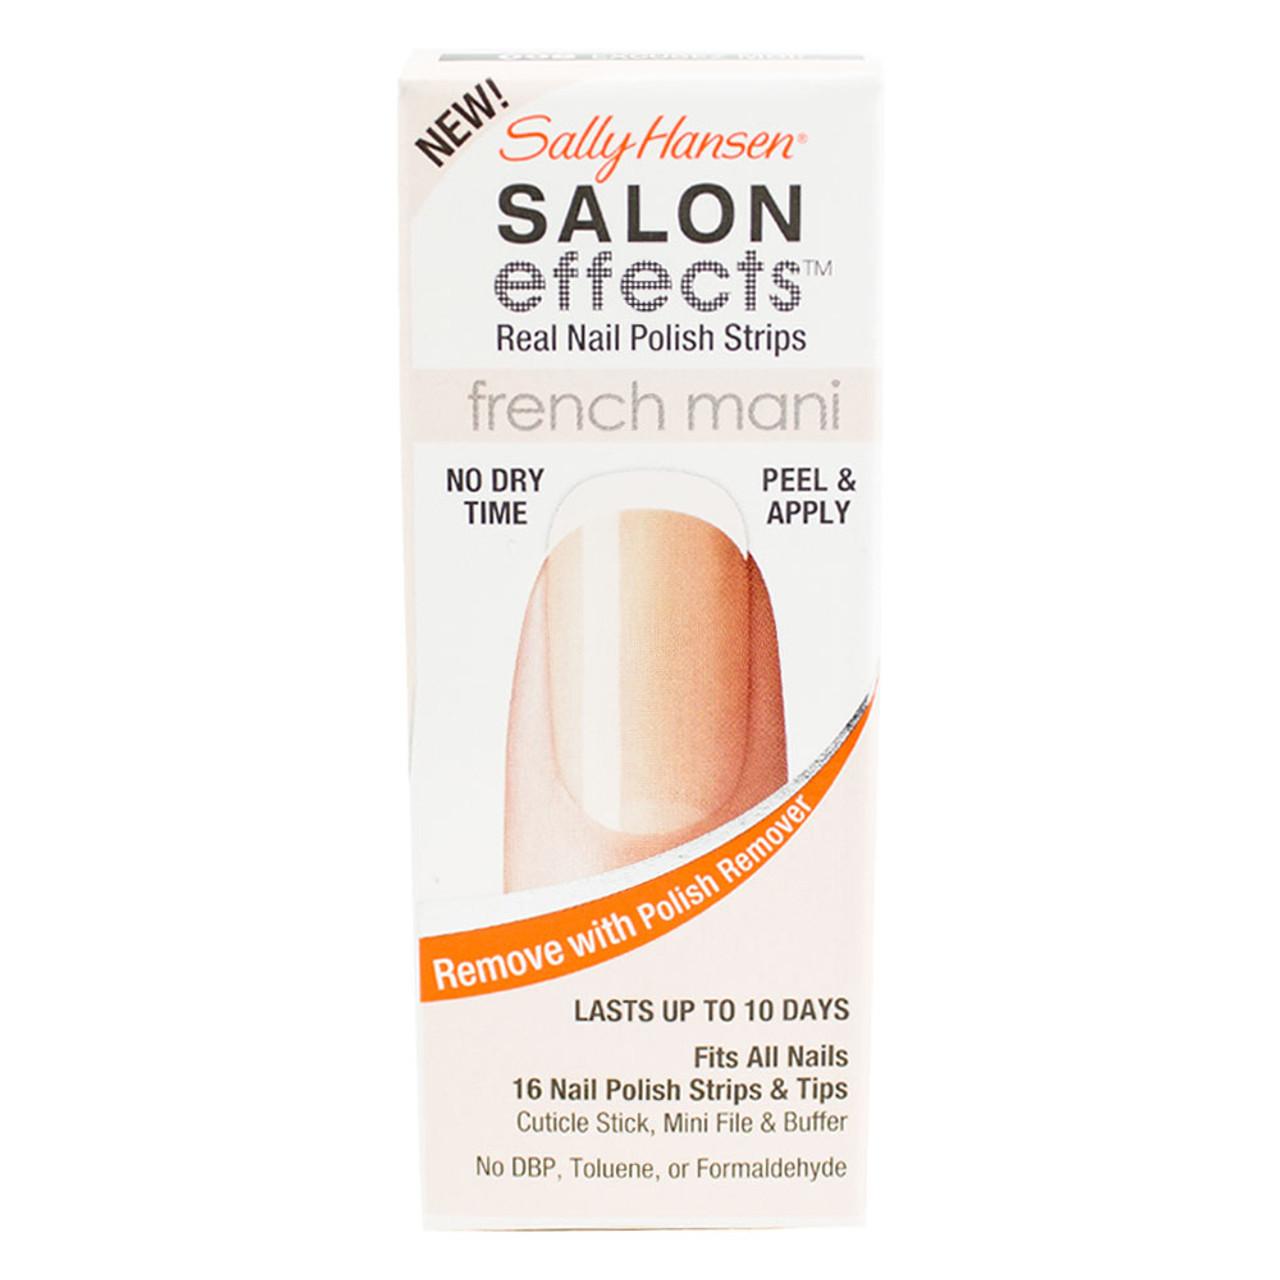 Sally Hansen Salon Effects Real Nail Polish Strips - BuyMeBeauty.com